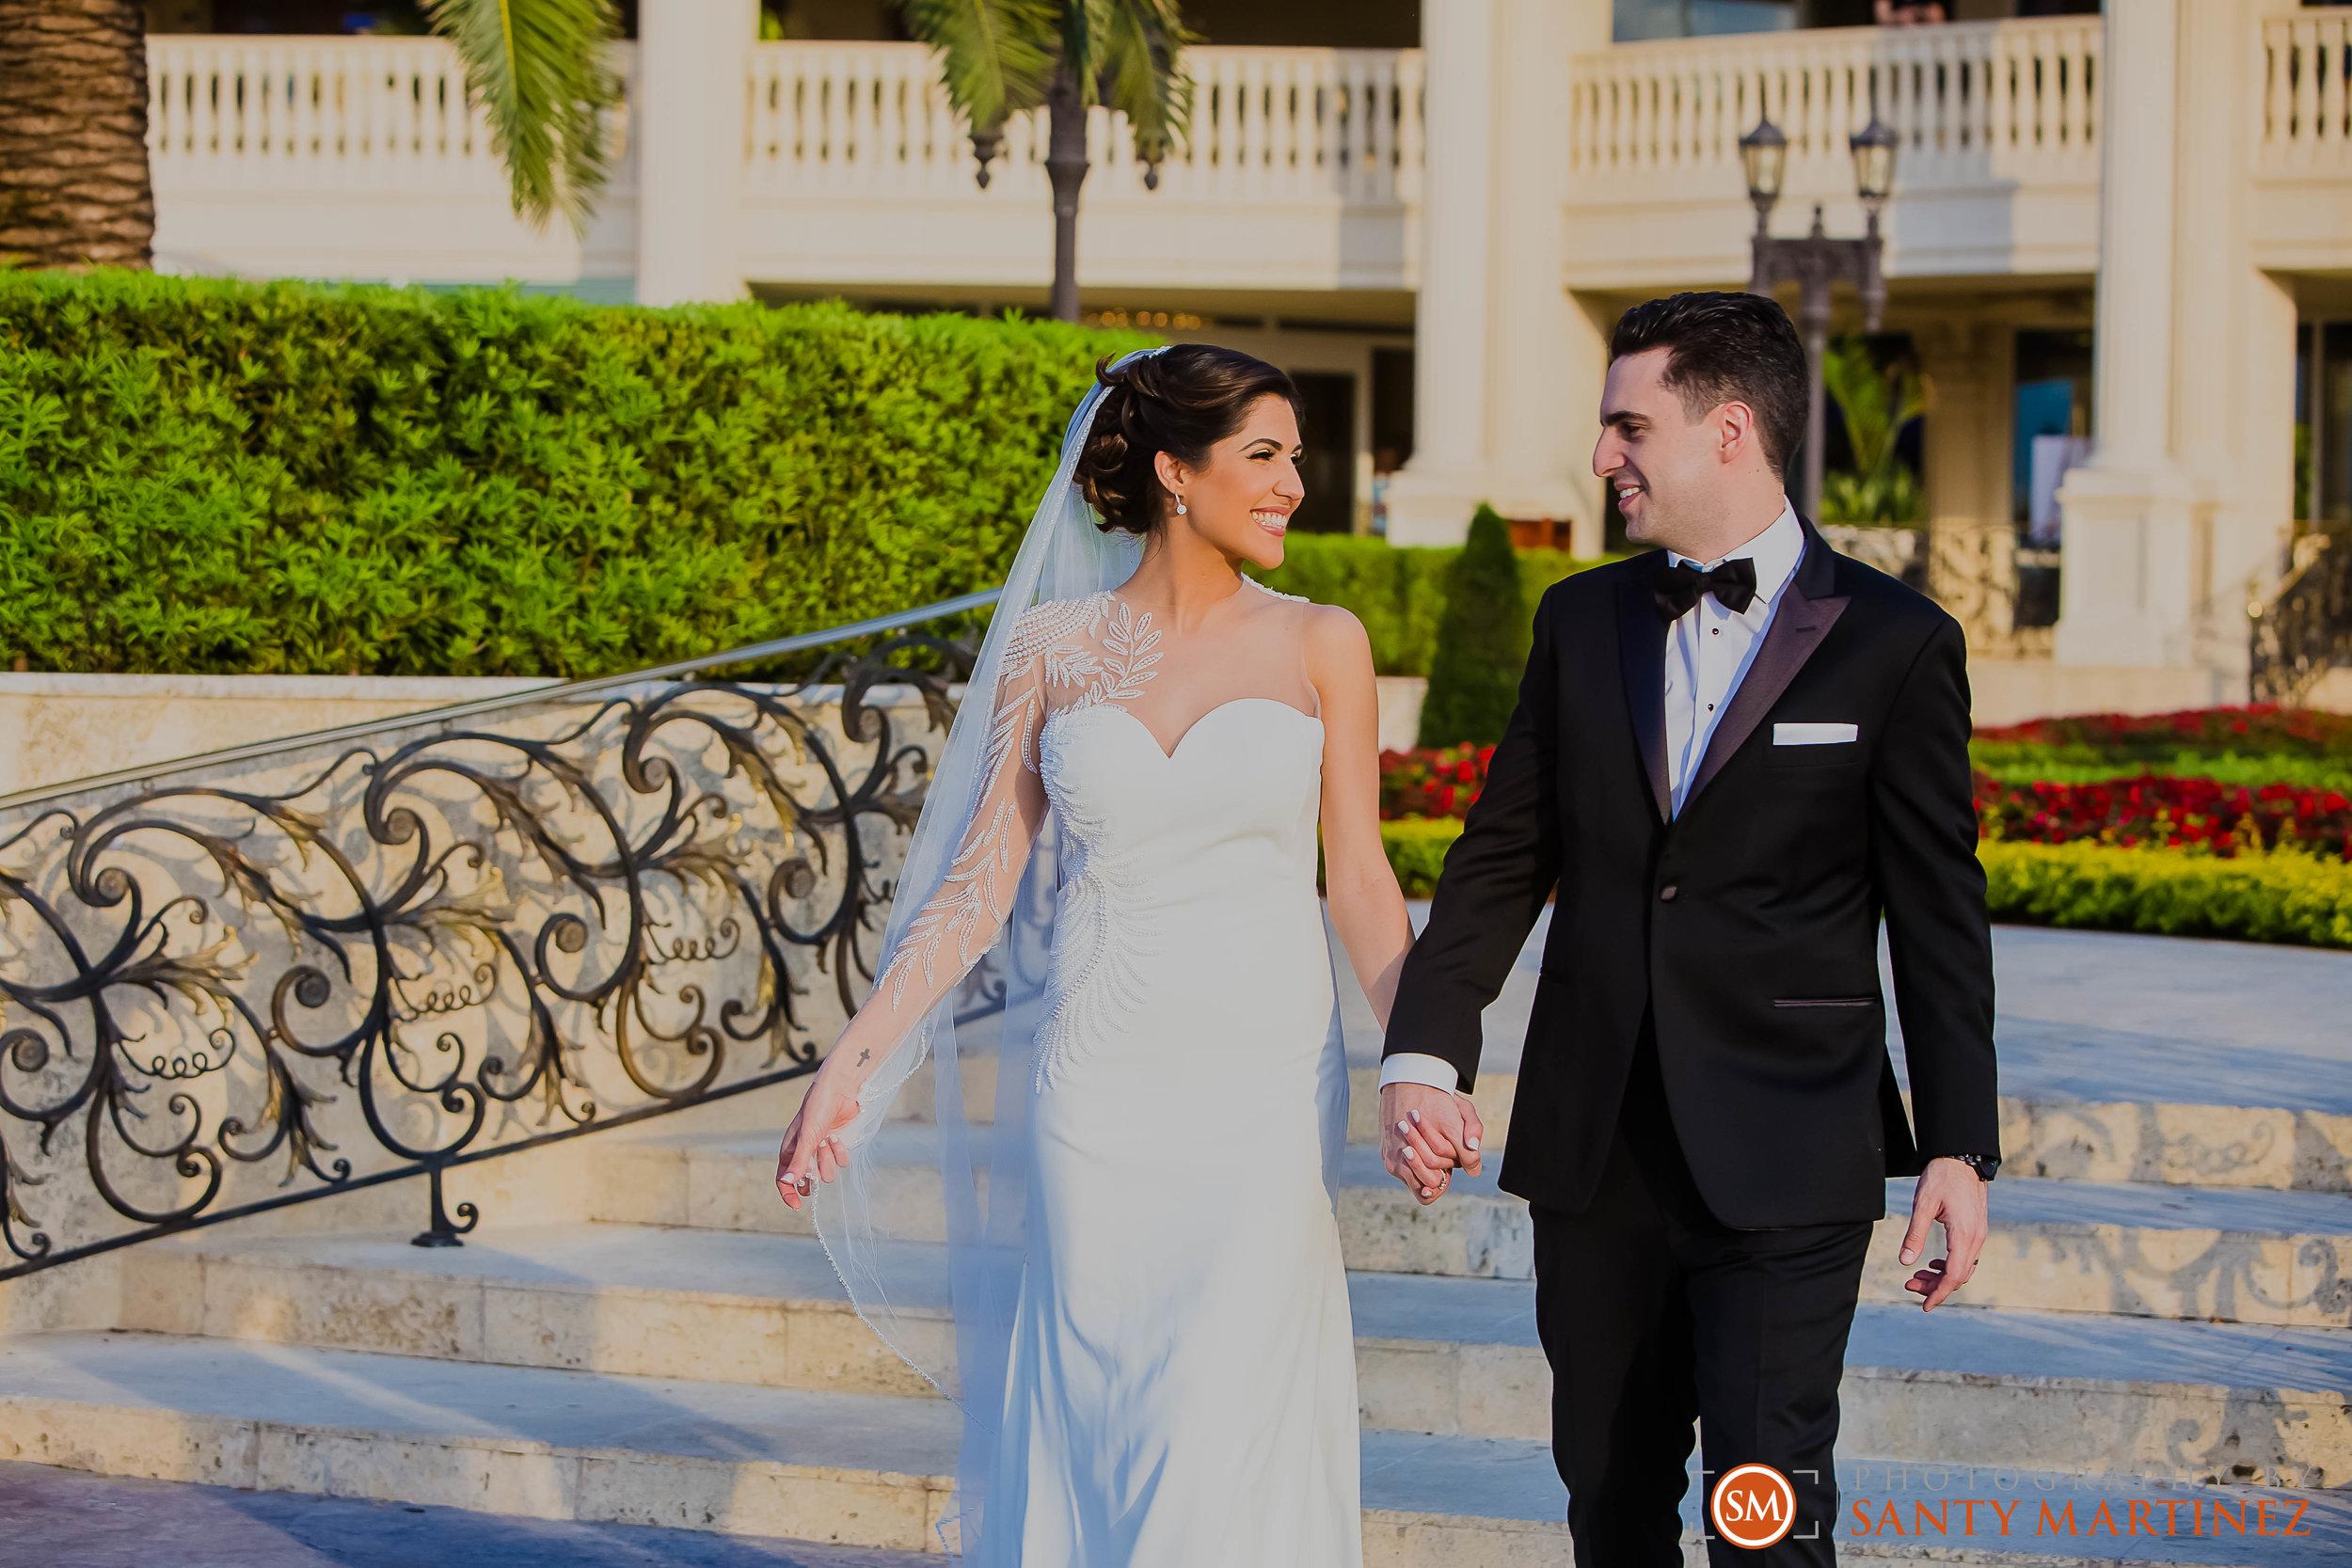 Wedding Trump National Doral Miami - Santy Martinez Photography-4.jpg